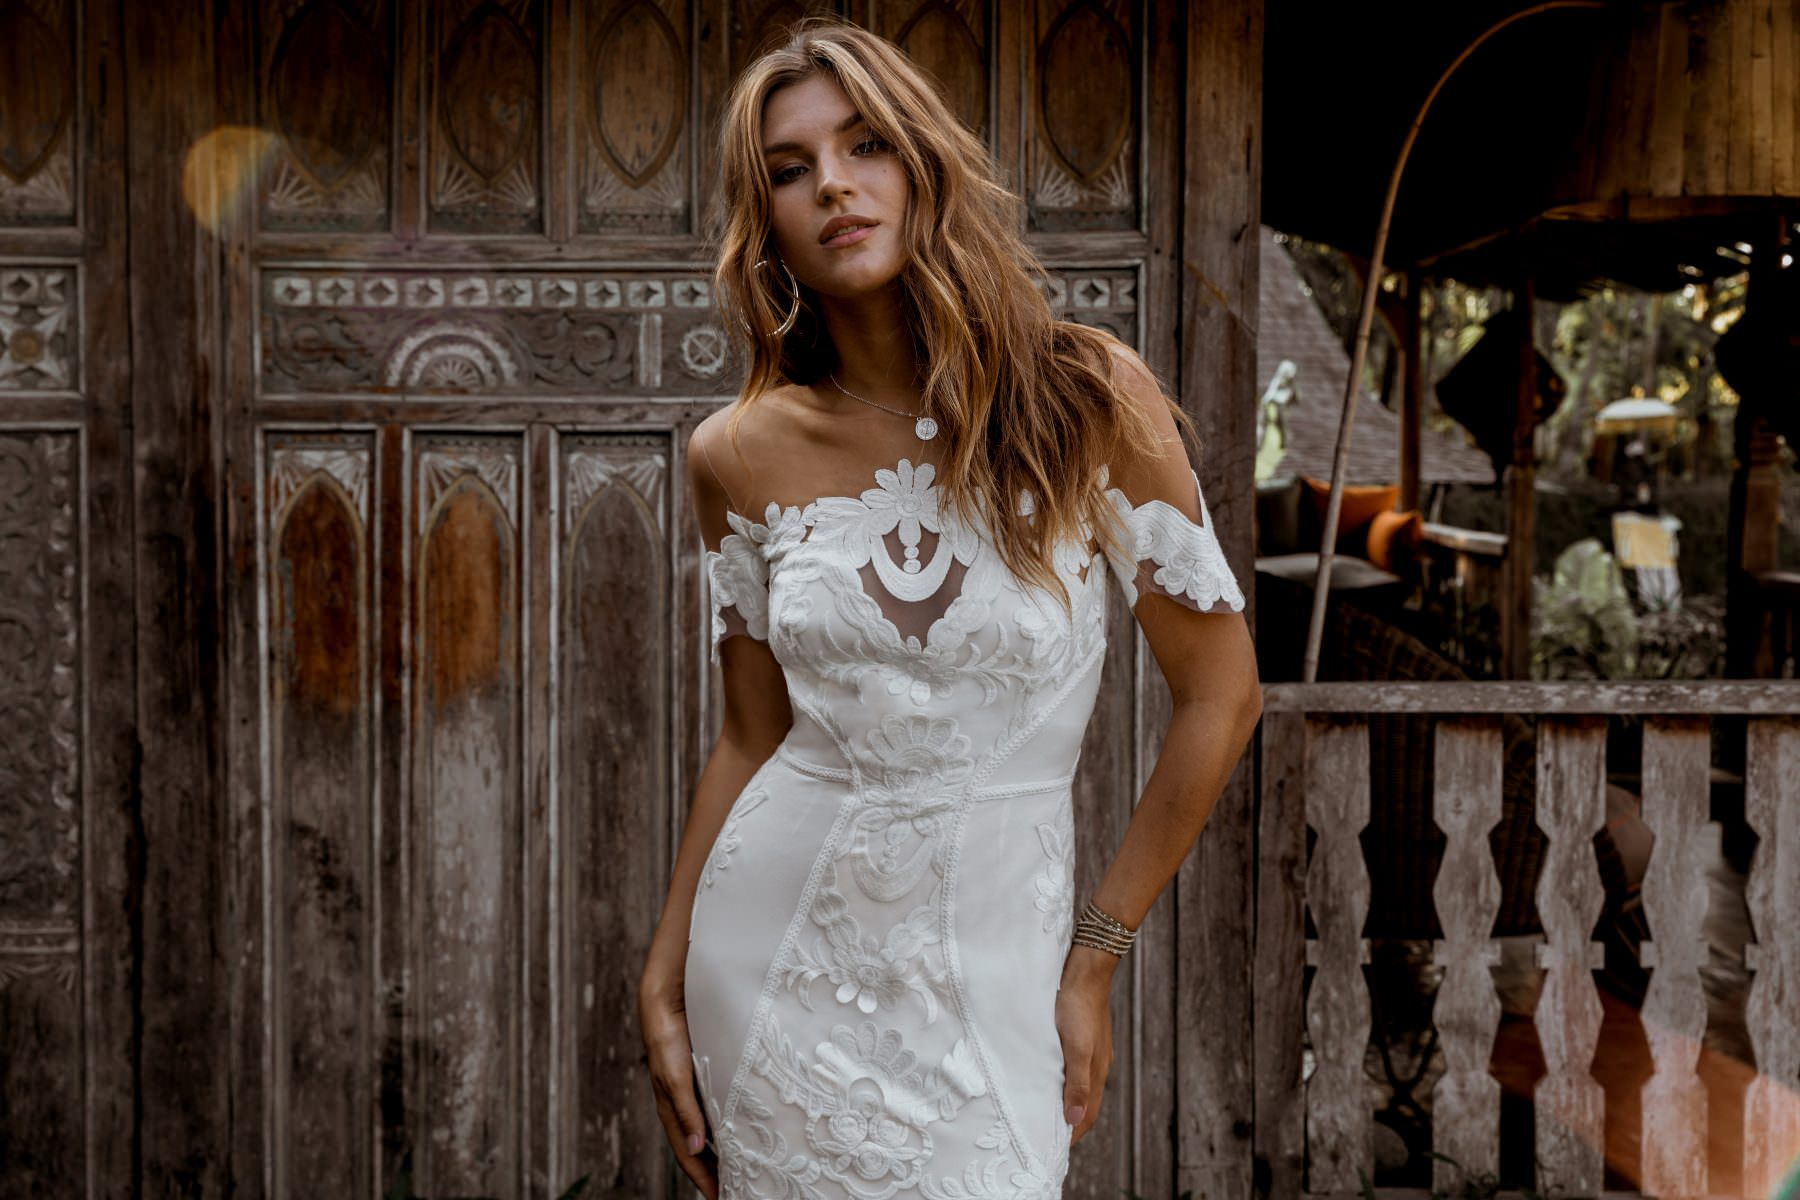 Harley lovers society wedding dresses Wedding Dress wedding dresses bridal shop store gowns christchurch wellington